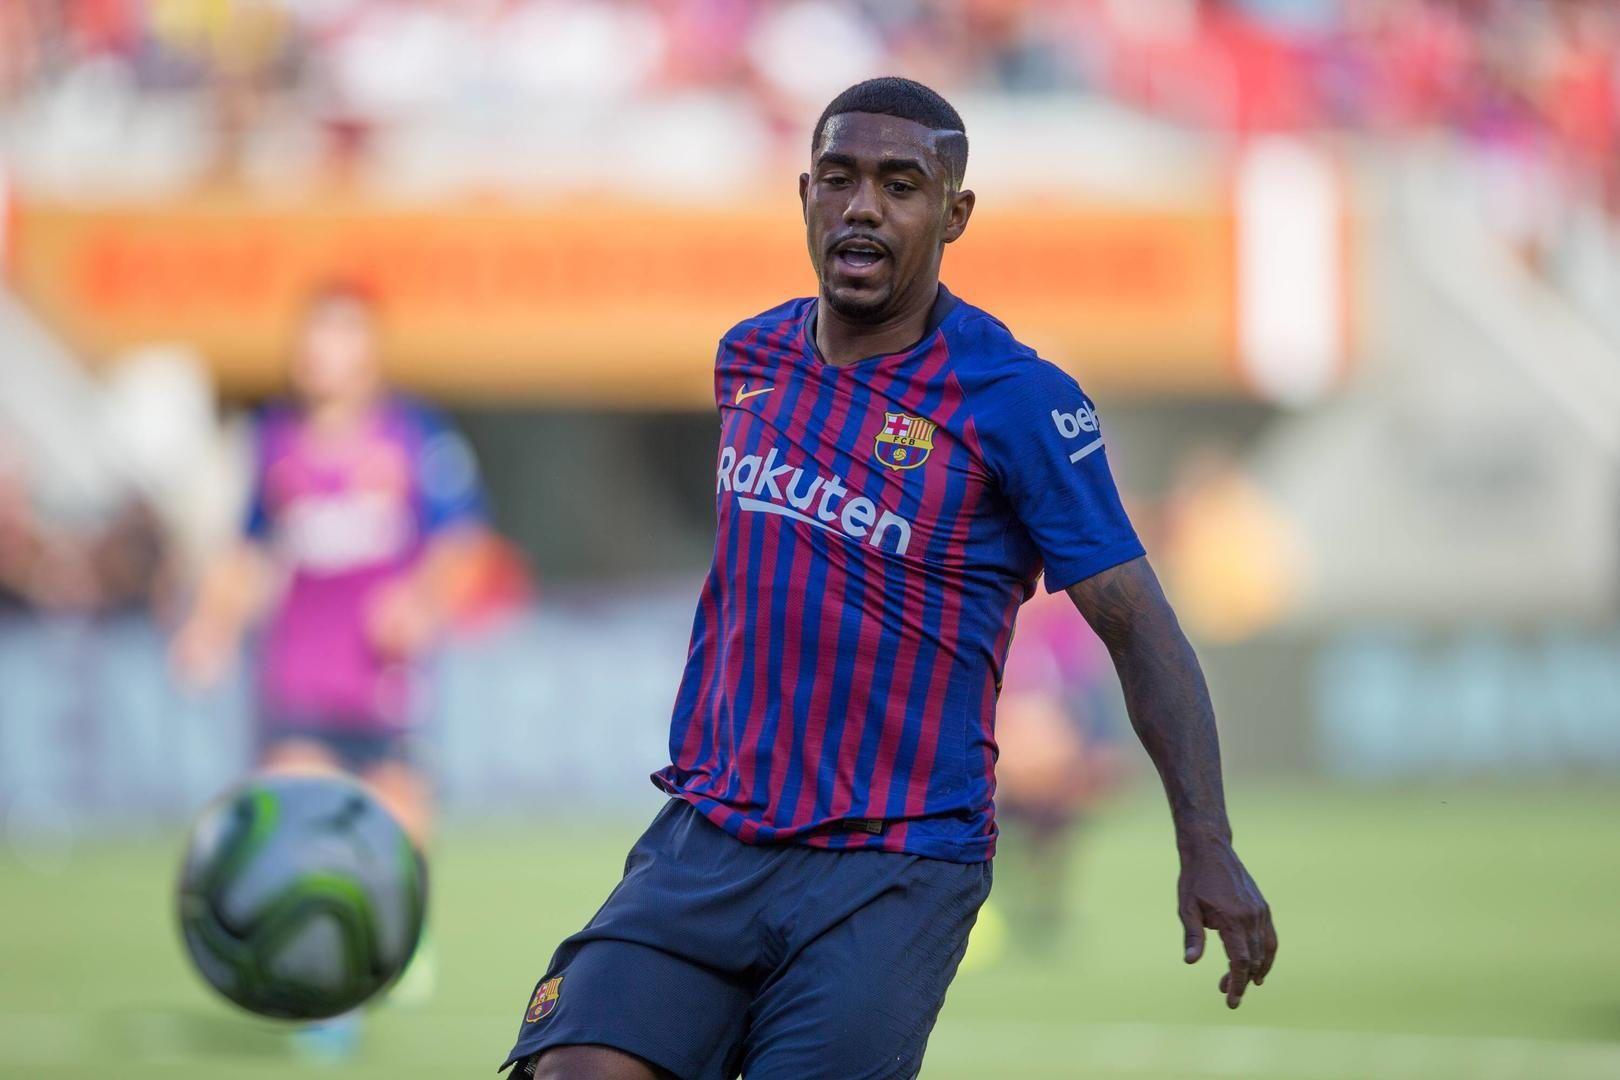 Malcom Sudah Siap Meninggalkan Barcelona